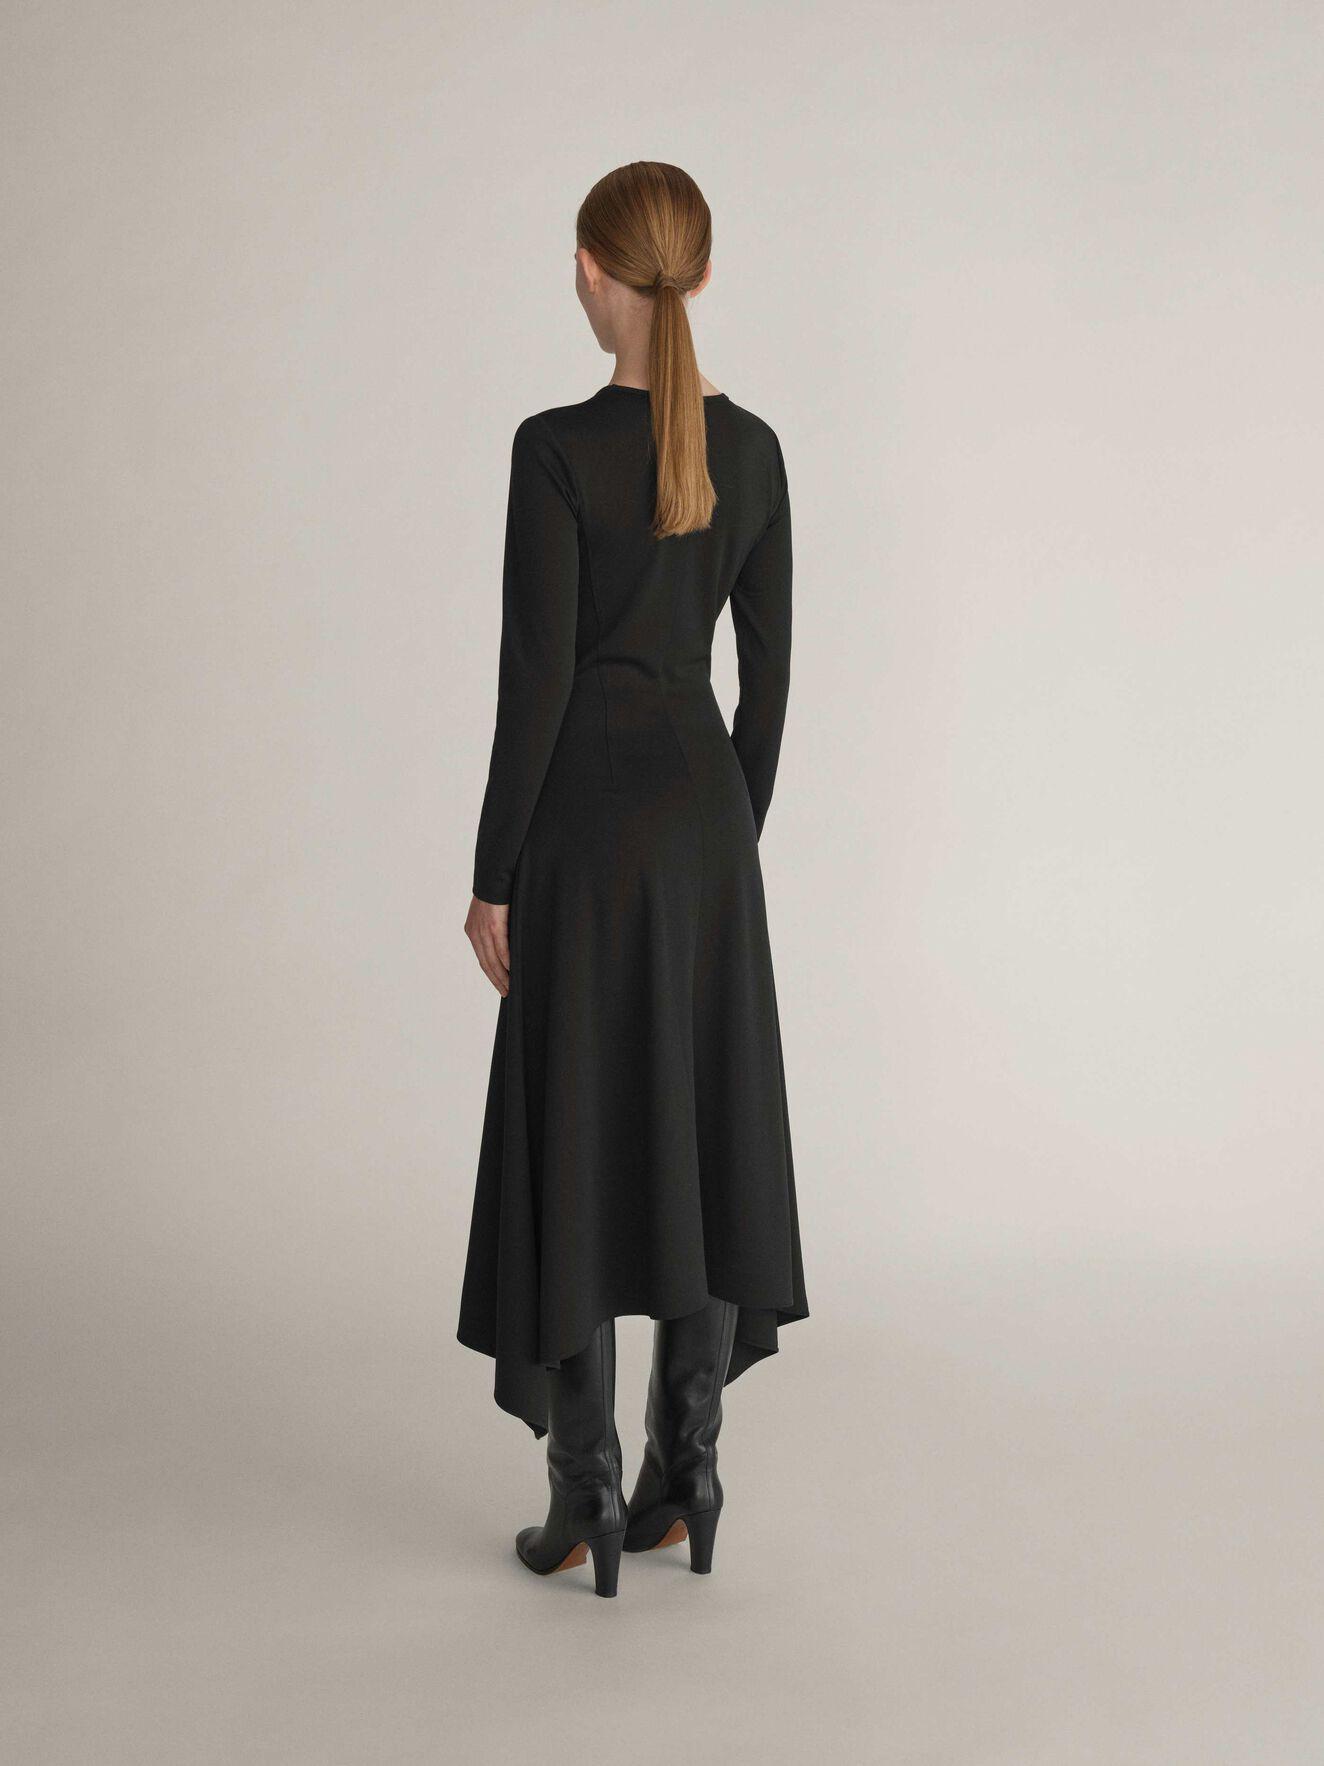 Pennylane Dress in Midnight Black from Tiger of Sweden